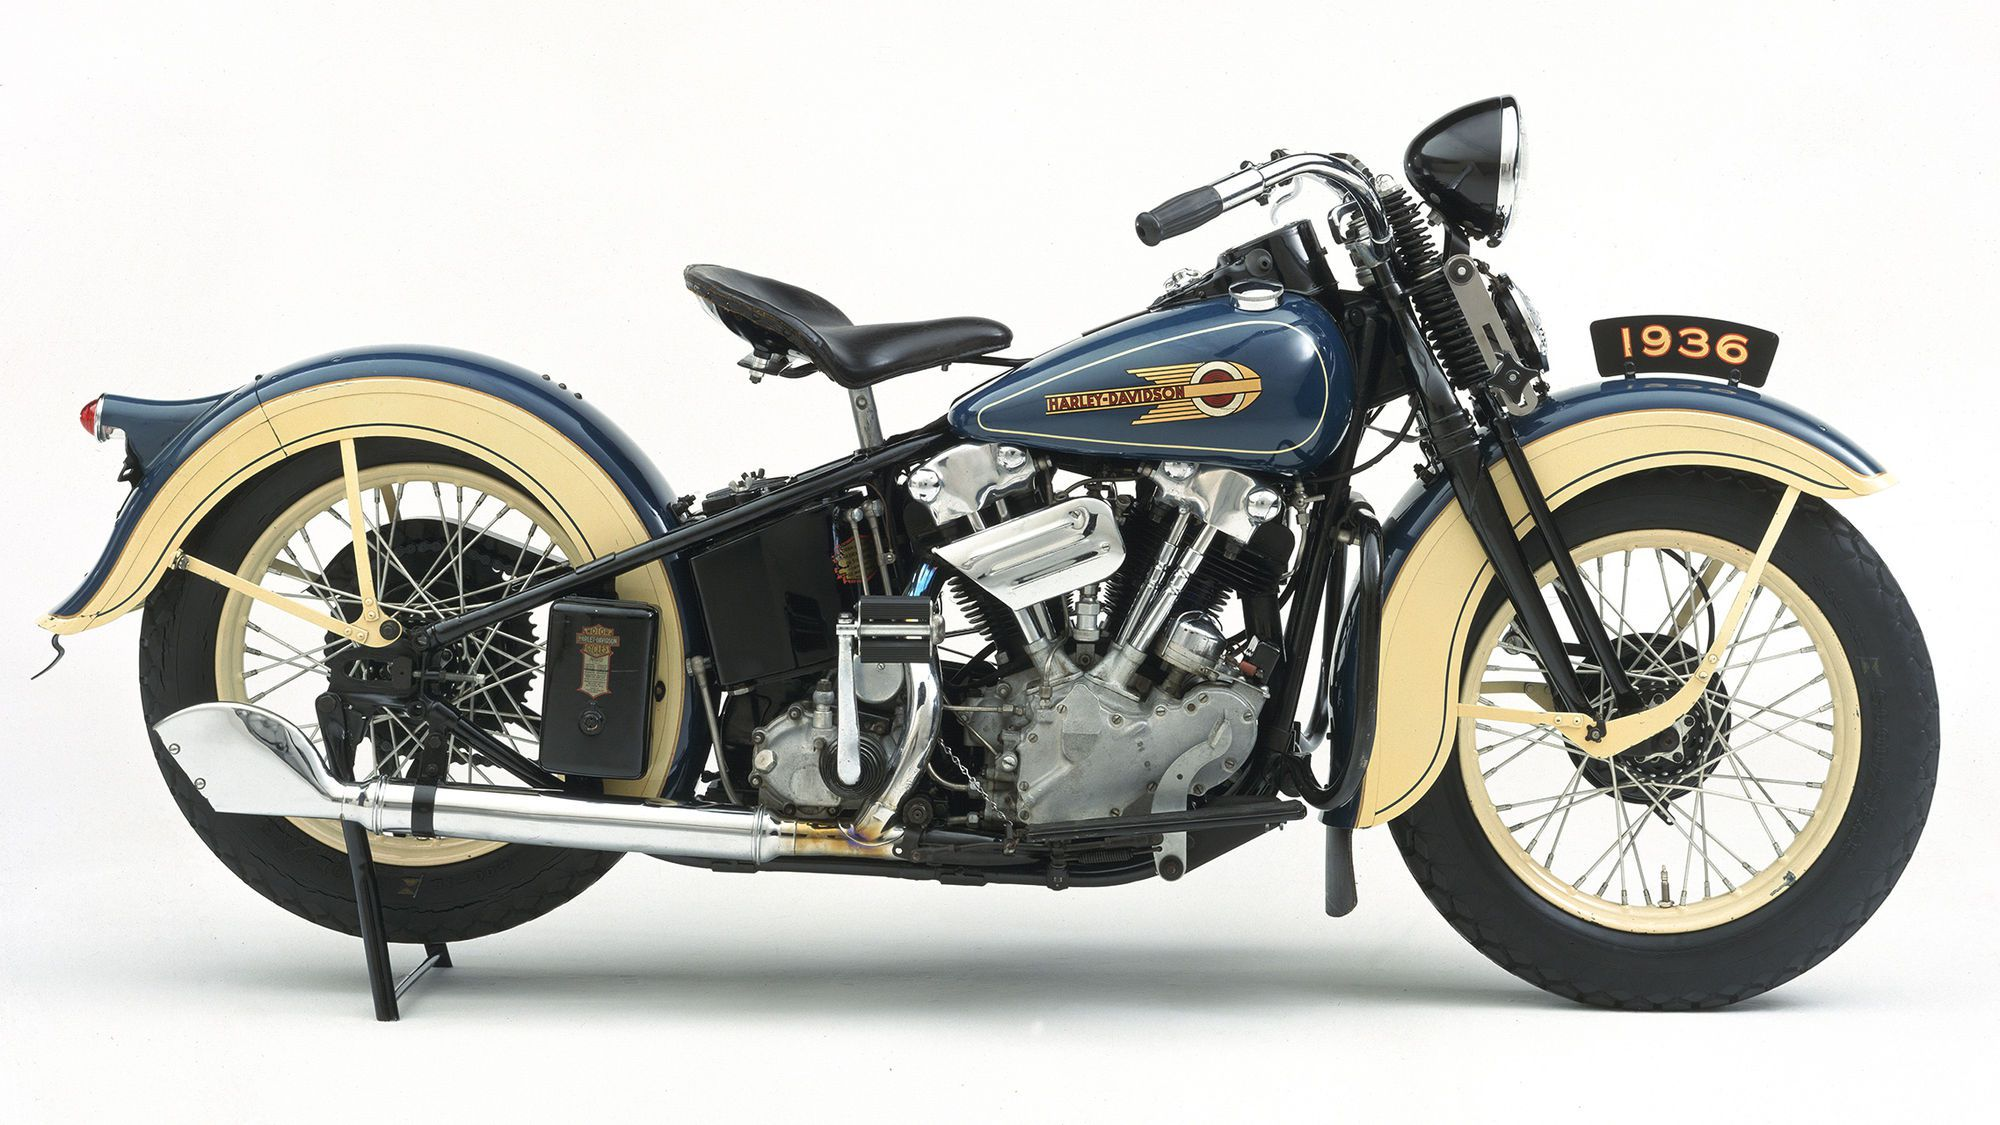 hight resolution of harley davidson shovelhead v twin motorcycles history of the big twin cycle world